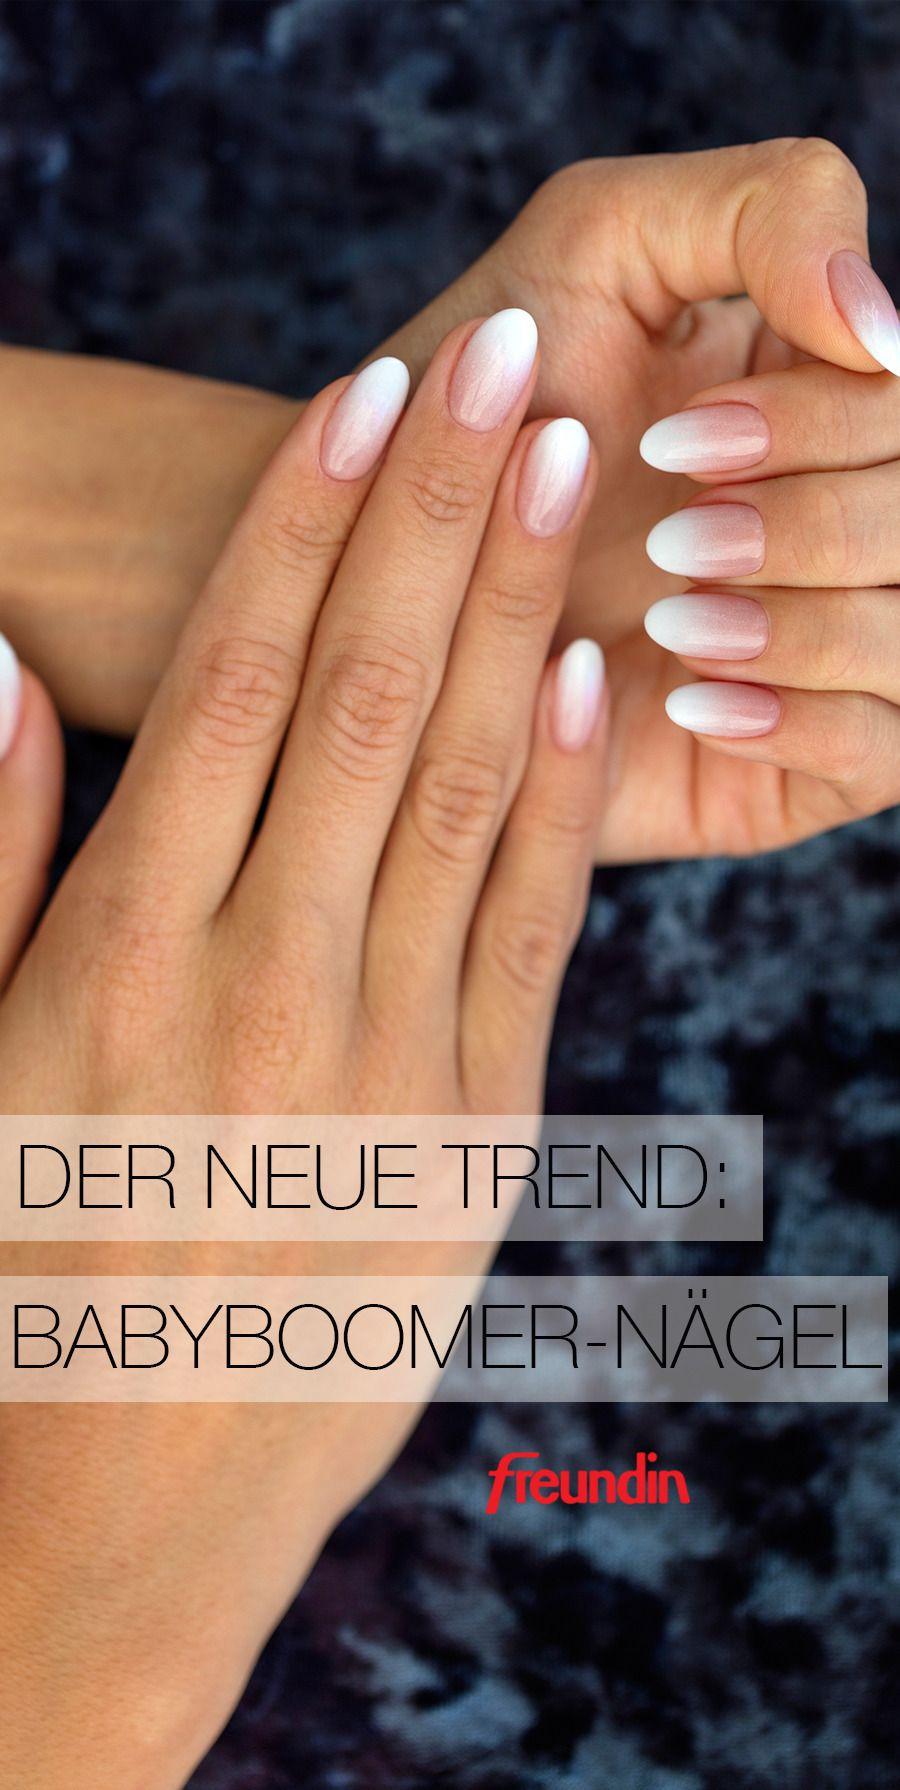 Photo of Der neue Beauty-Trend auf Pinterest: Babyboomer-Nägel | freundin.de